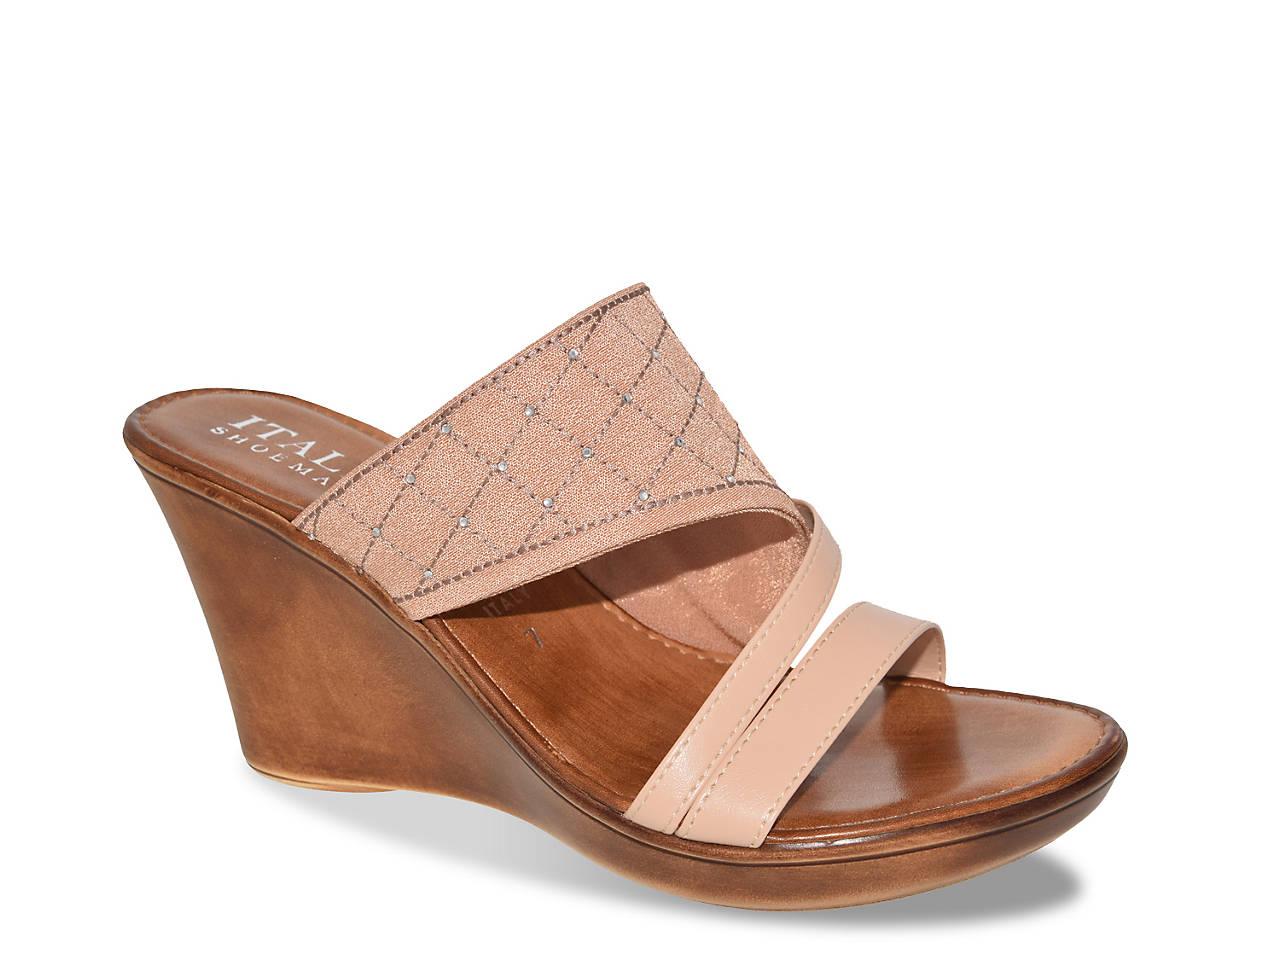 Tiia Wedge Sandal by Italian Shoemakers